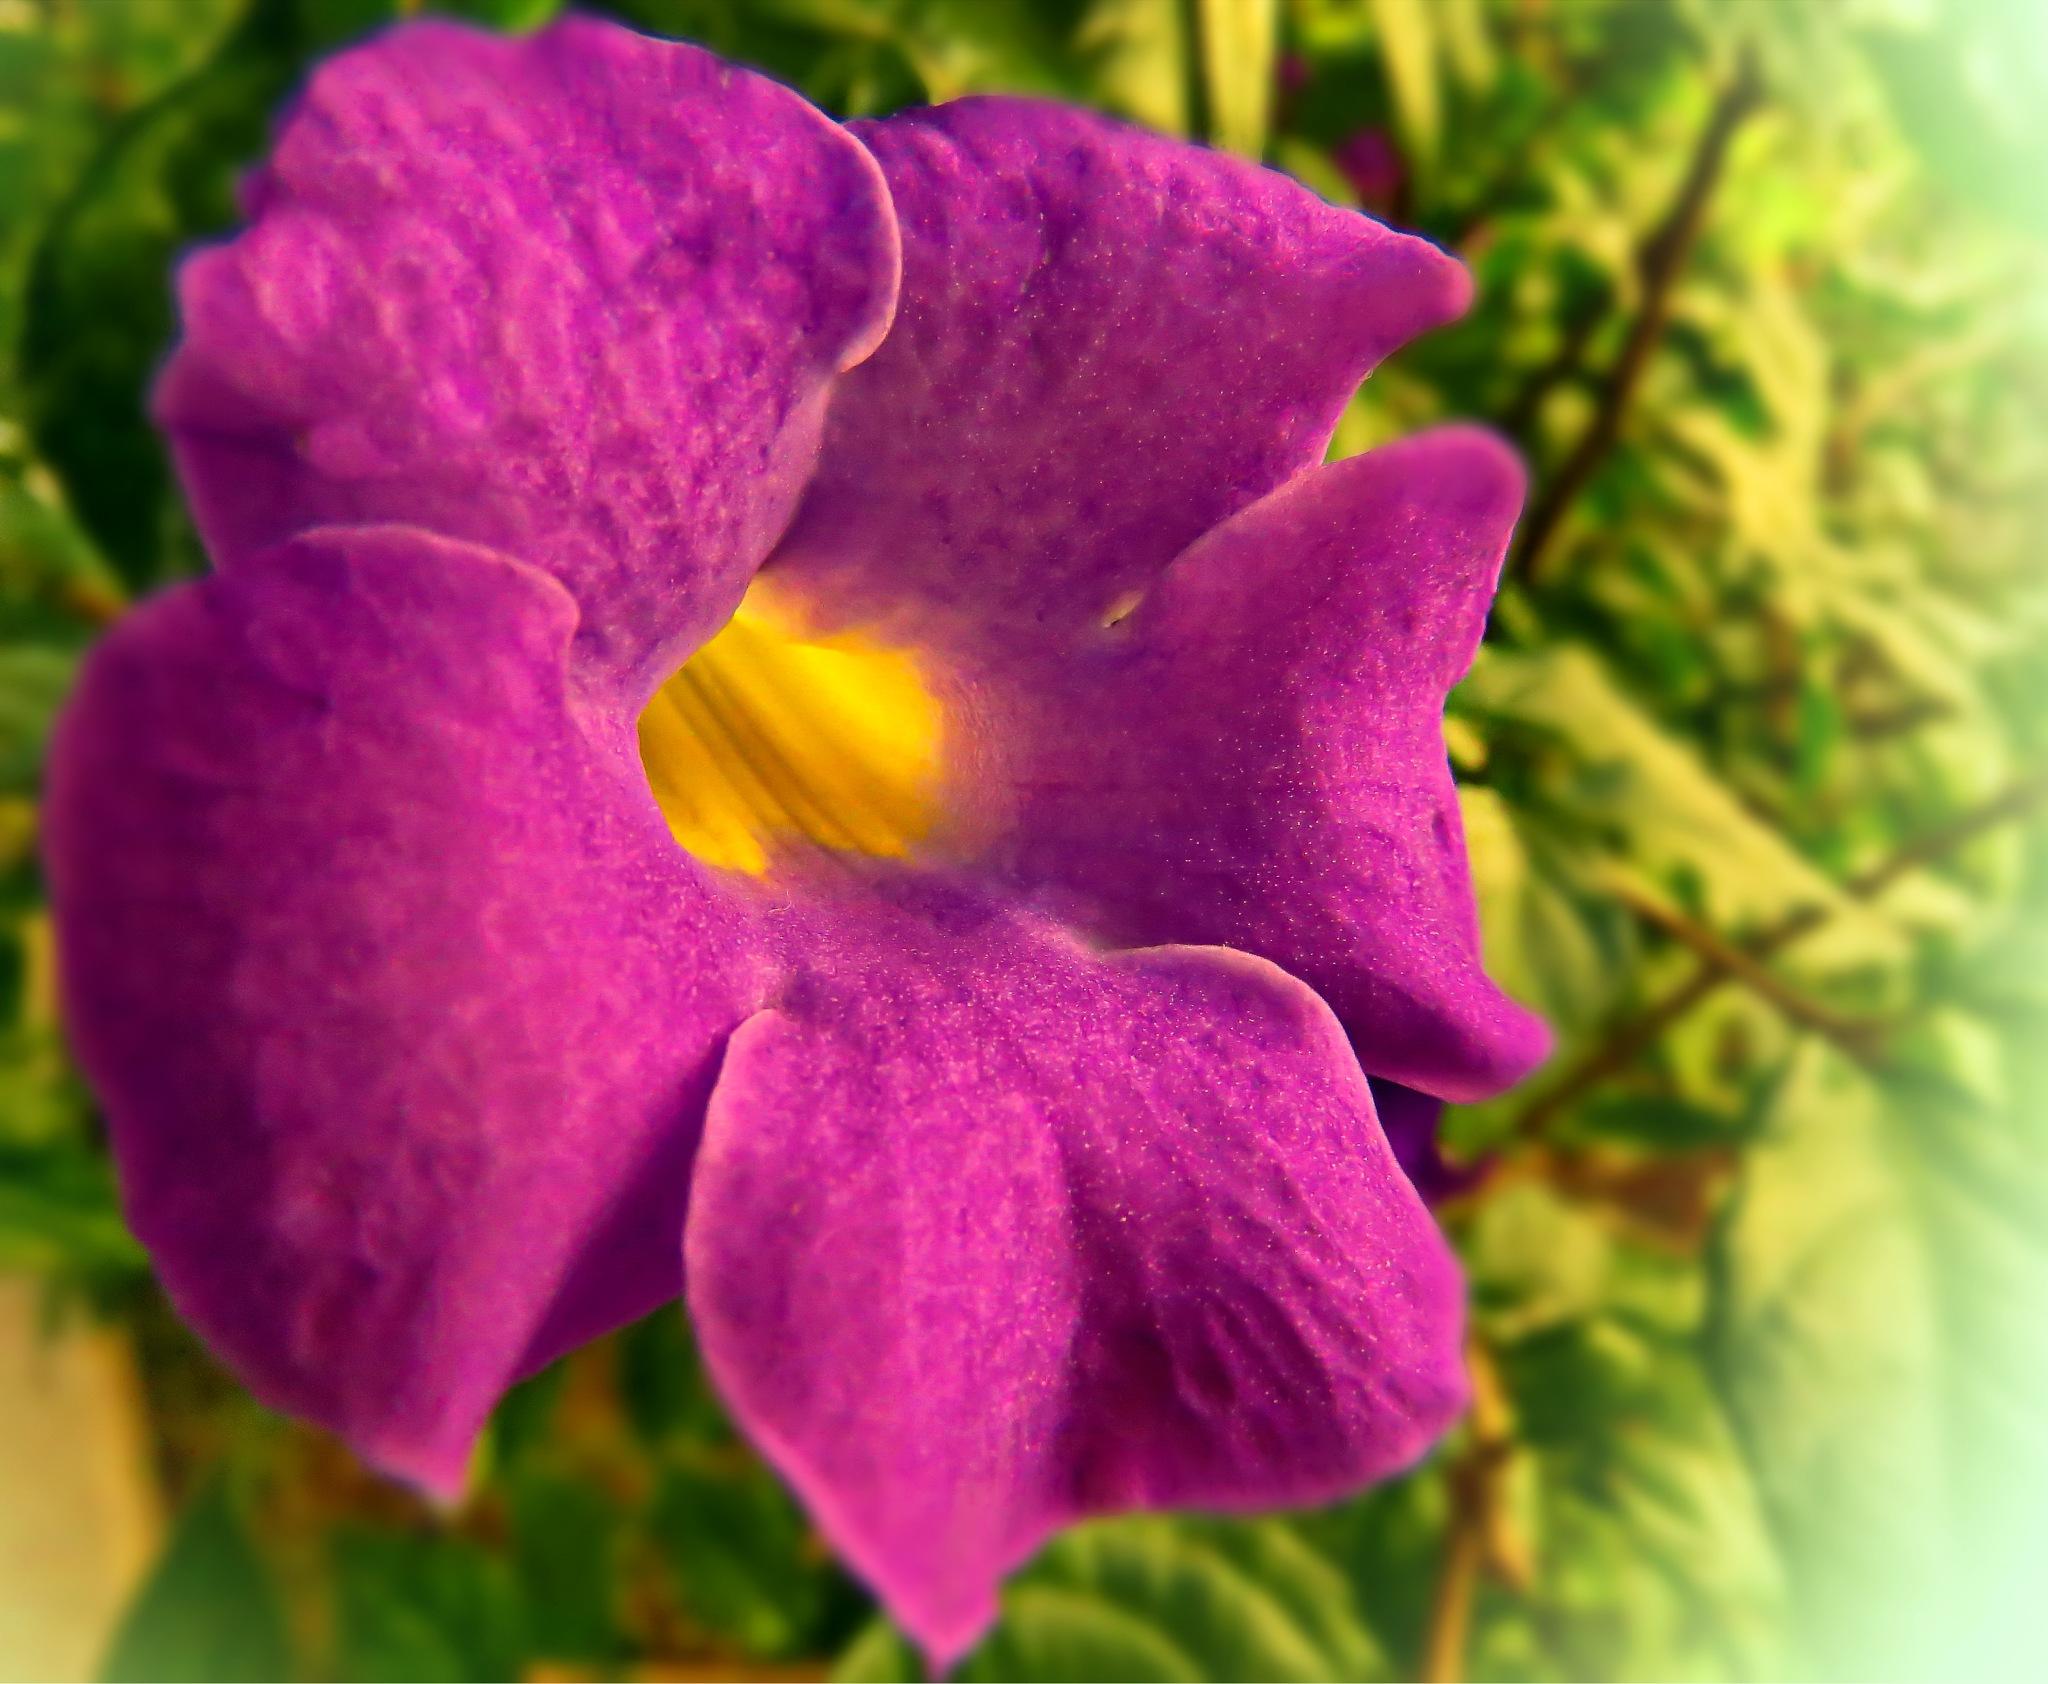 Petunia flower by Nestor